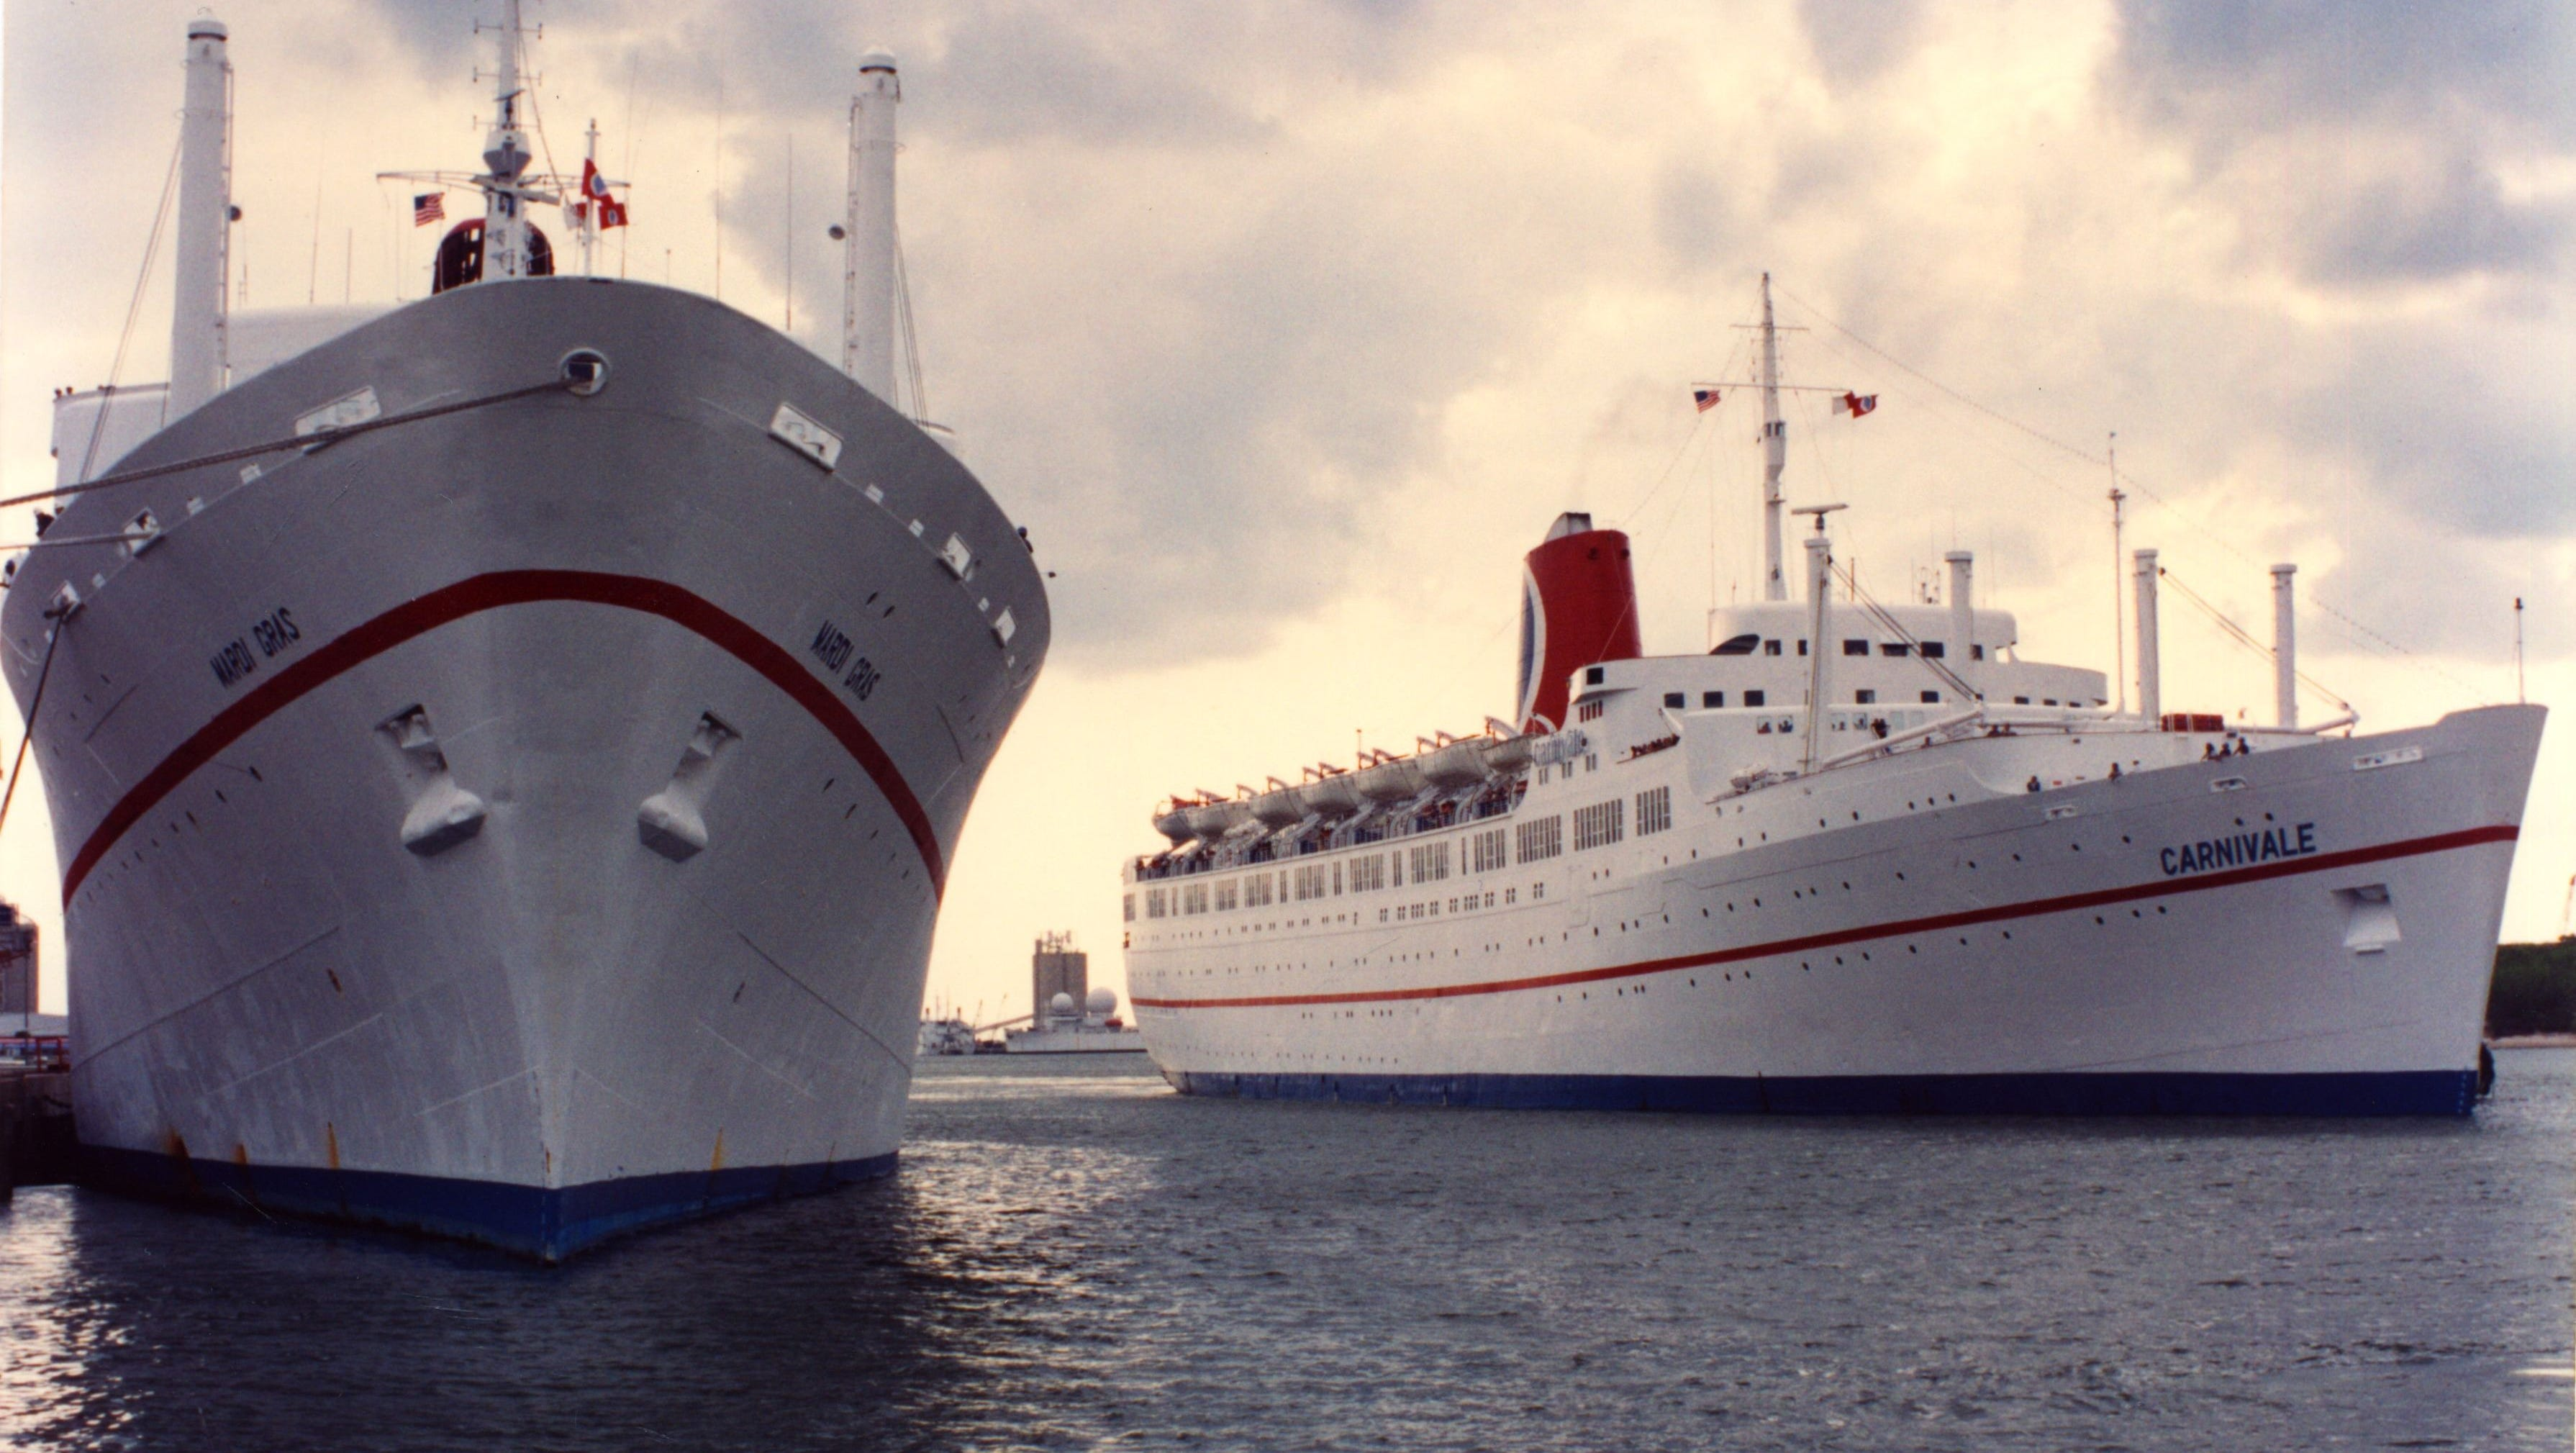 Carnival Cruise Line Ships Mardi Gras Carnivale Festivale In Photos